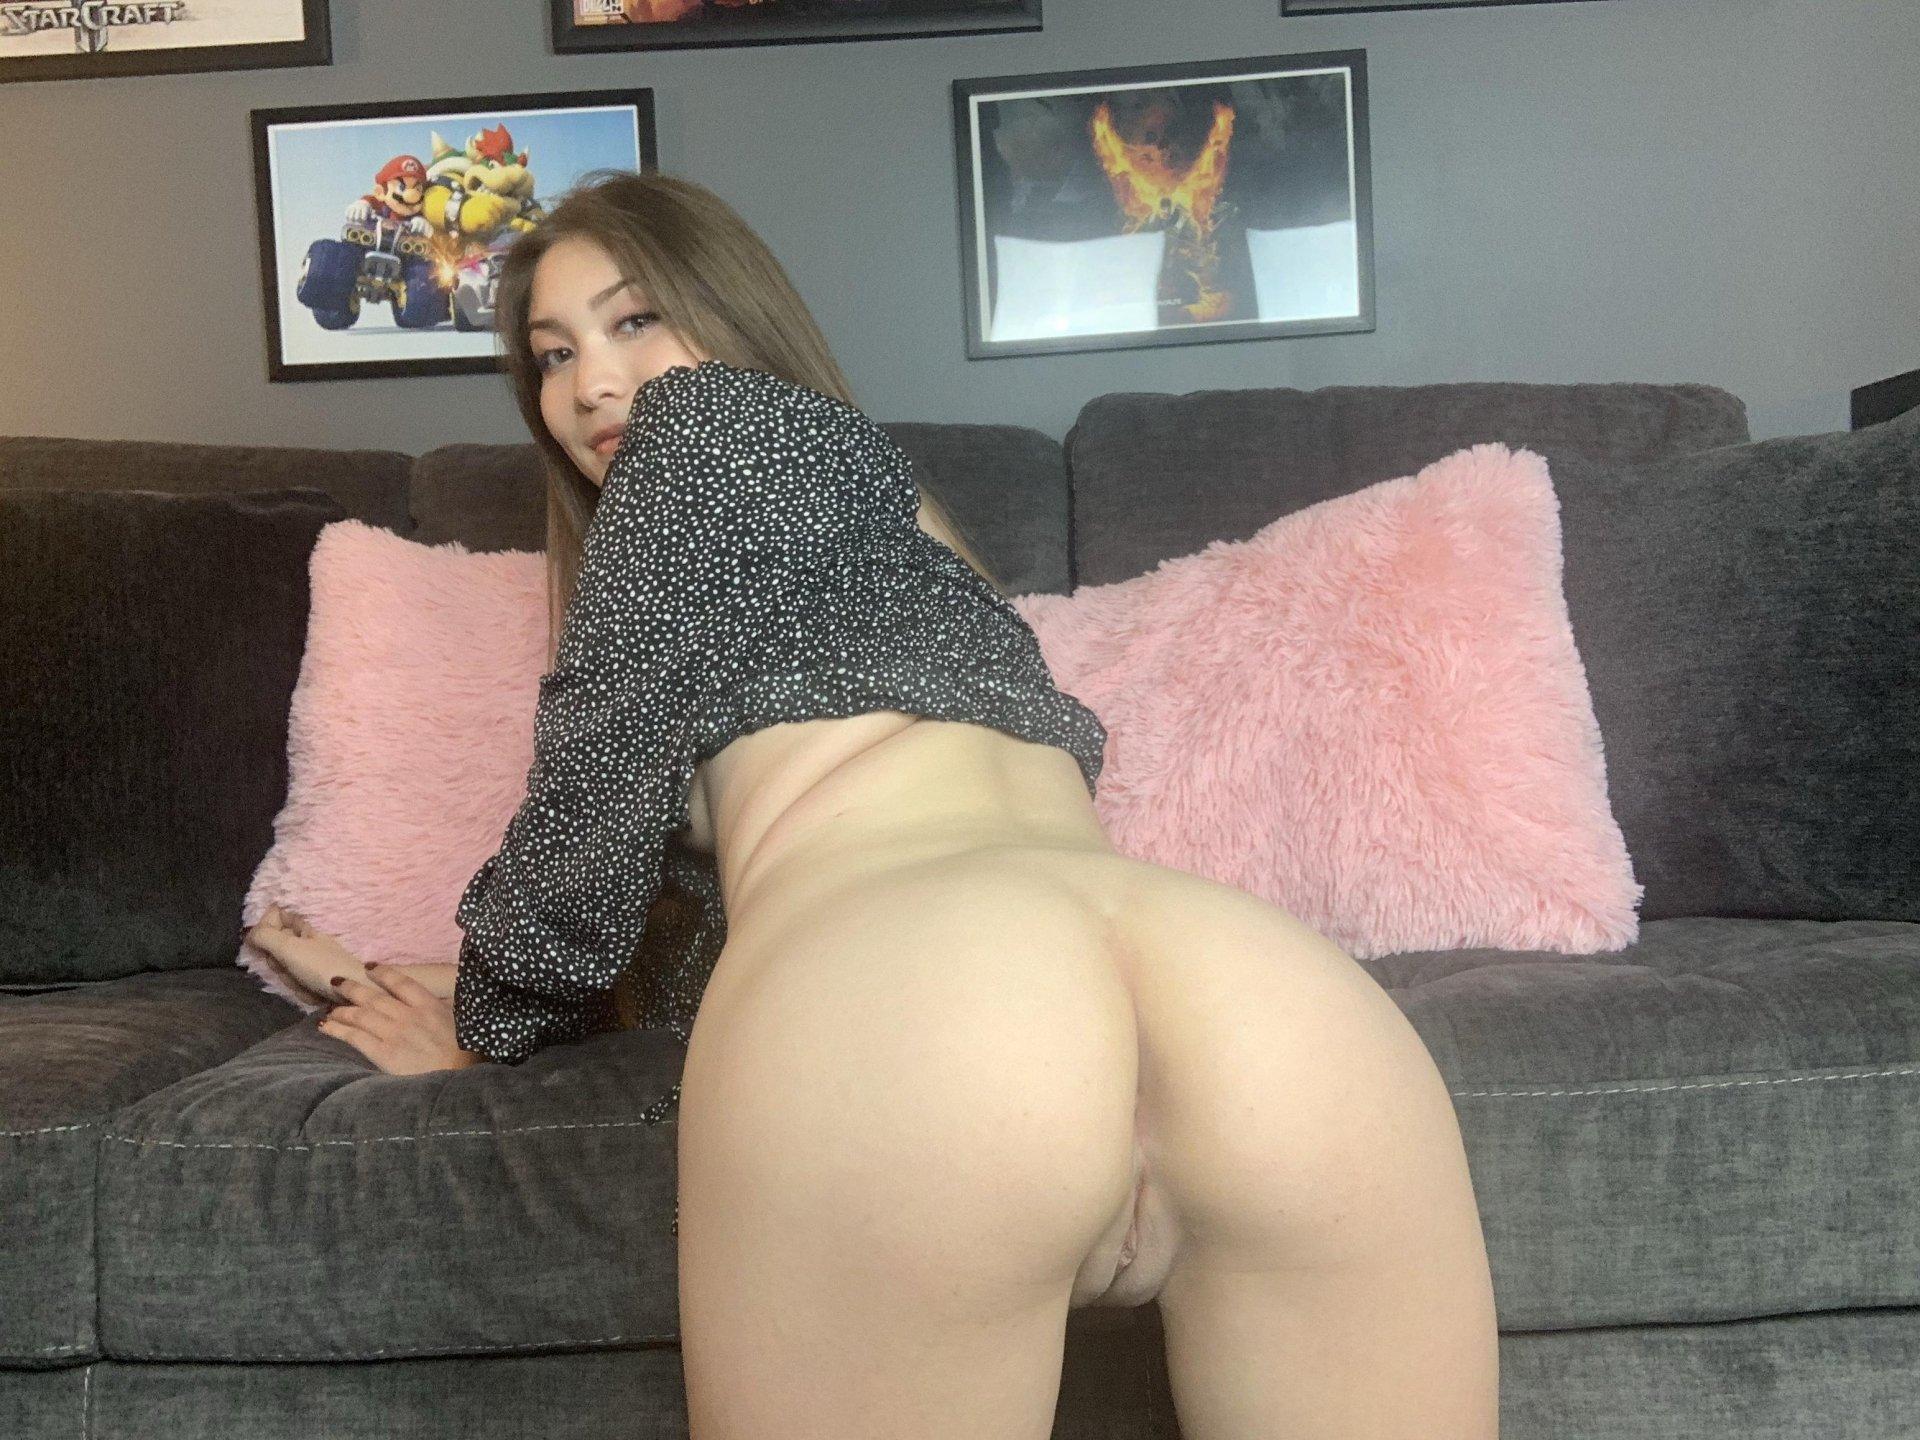 MistressSienna from Kirklees,United Kingdom